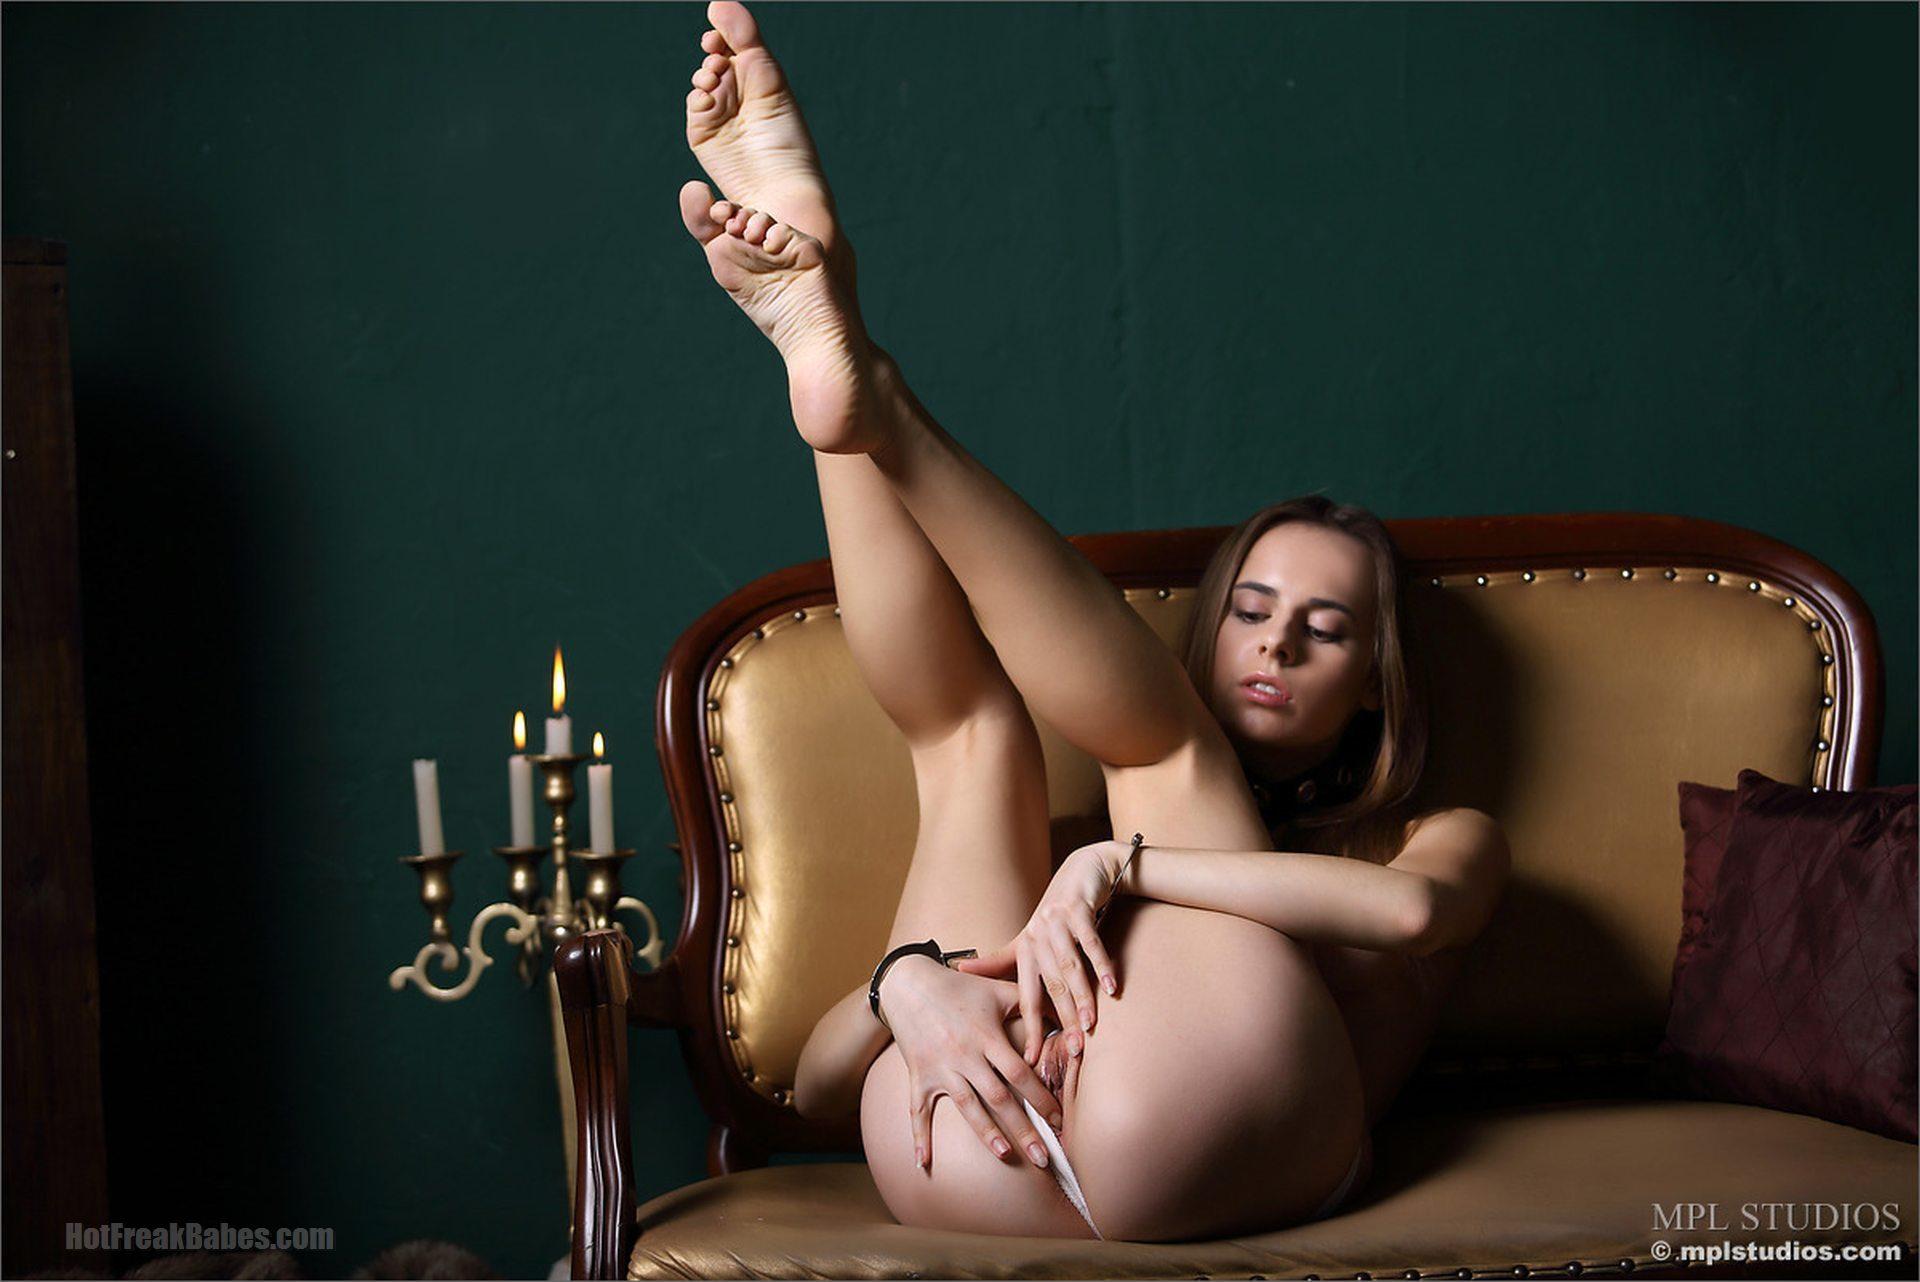 MPL Studios - Gracie in Unfettered, Aztek Santiago, nude, bare feet, shaved, handcuffs, bondage, slim girl, puffy nipples, MPL Studios, Russian Nudes, Erotic Art, Nude Teen, Studio Girl, Nudes Fashion